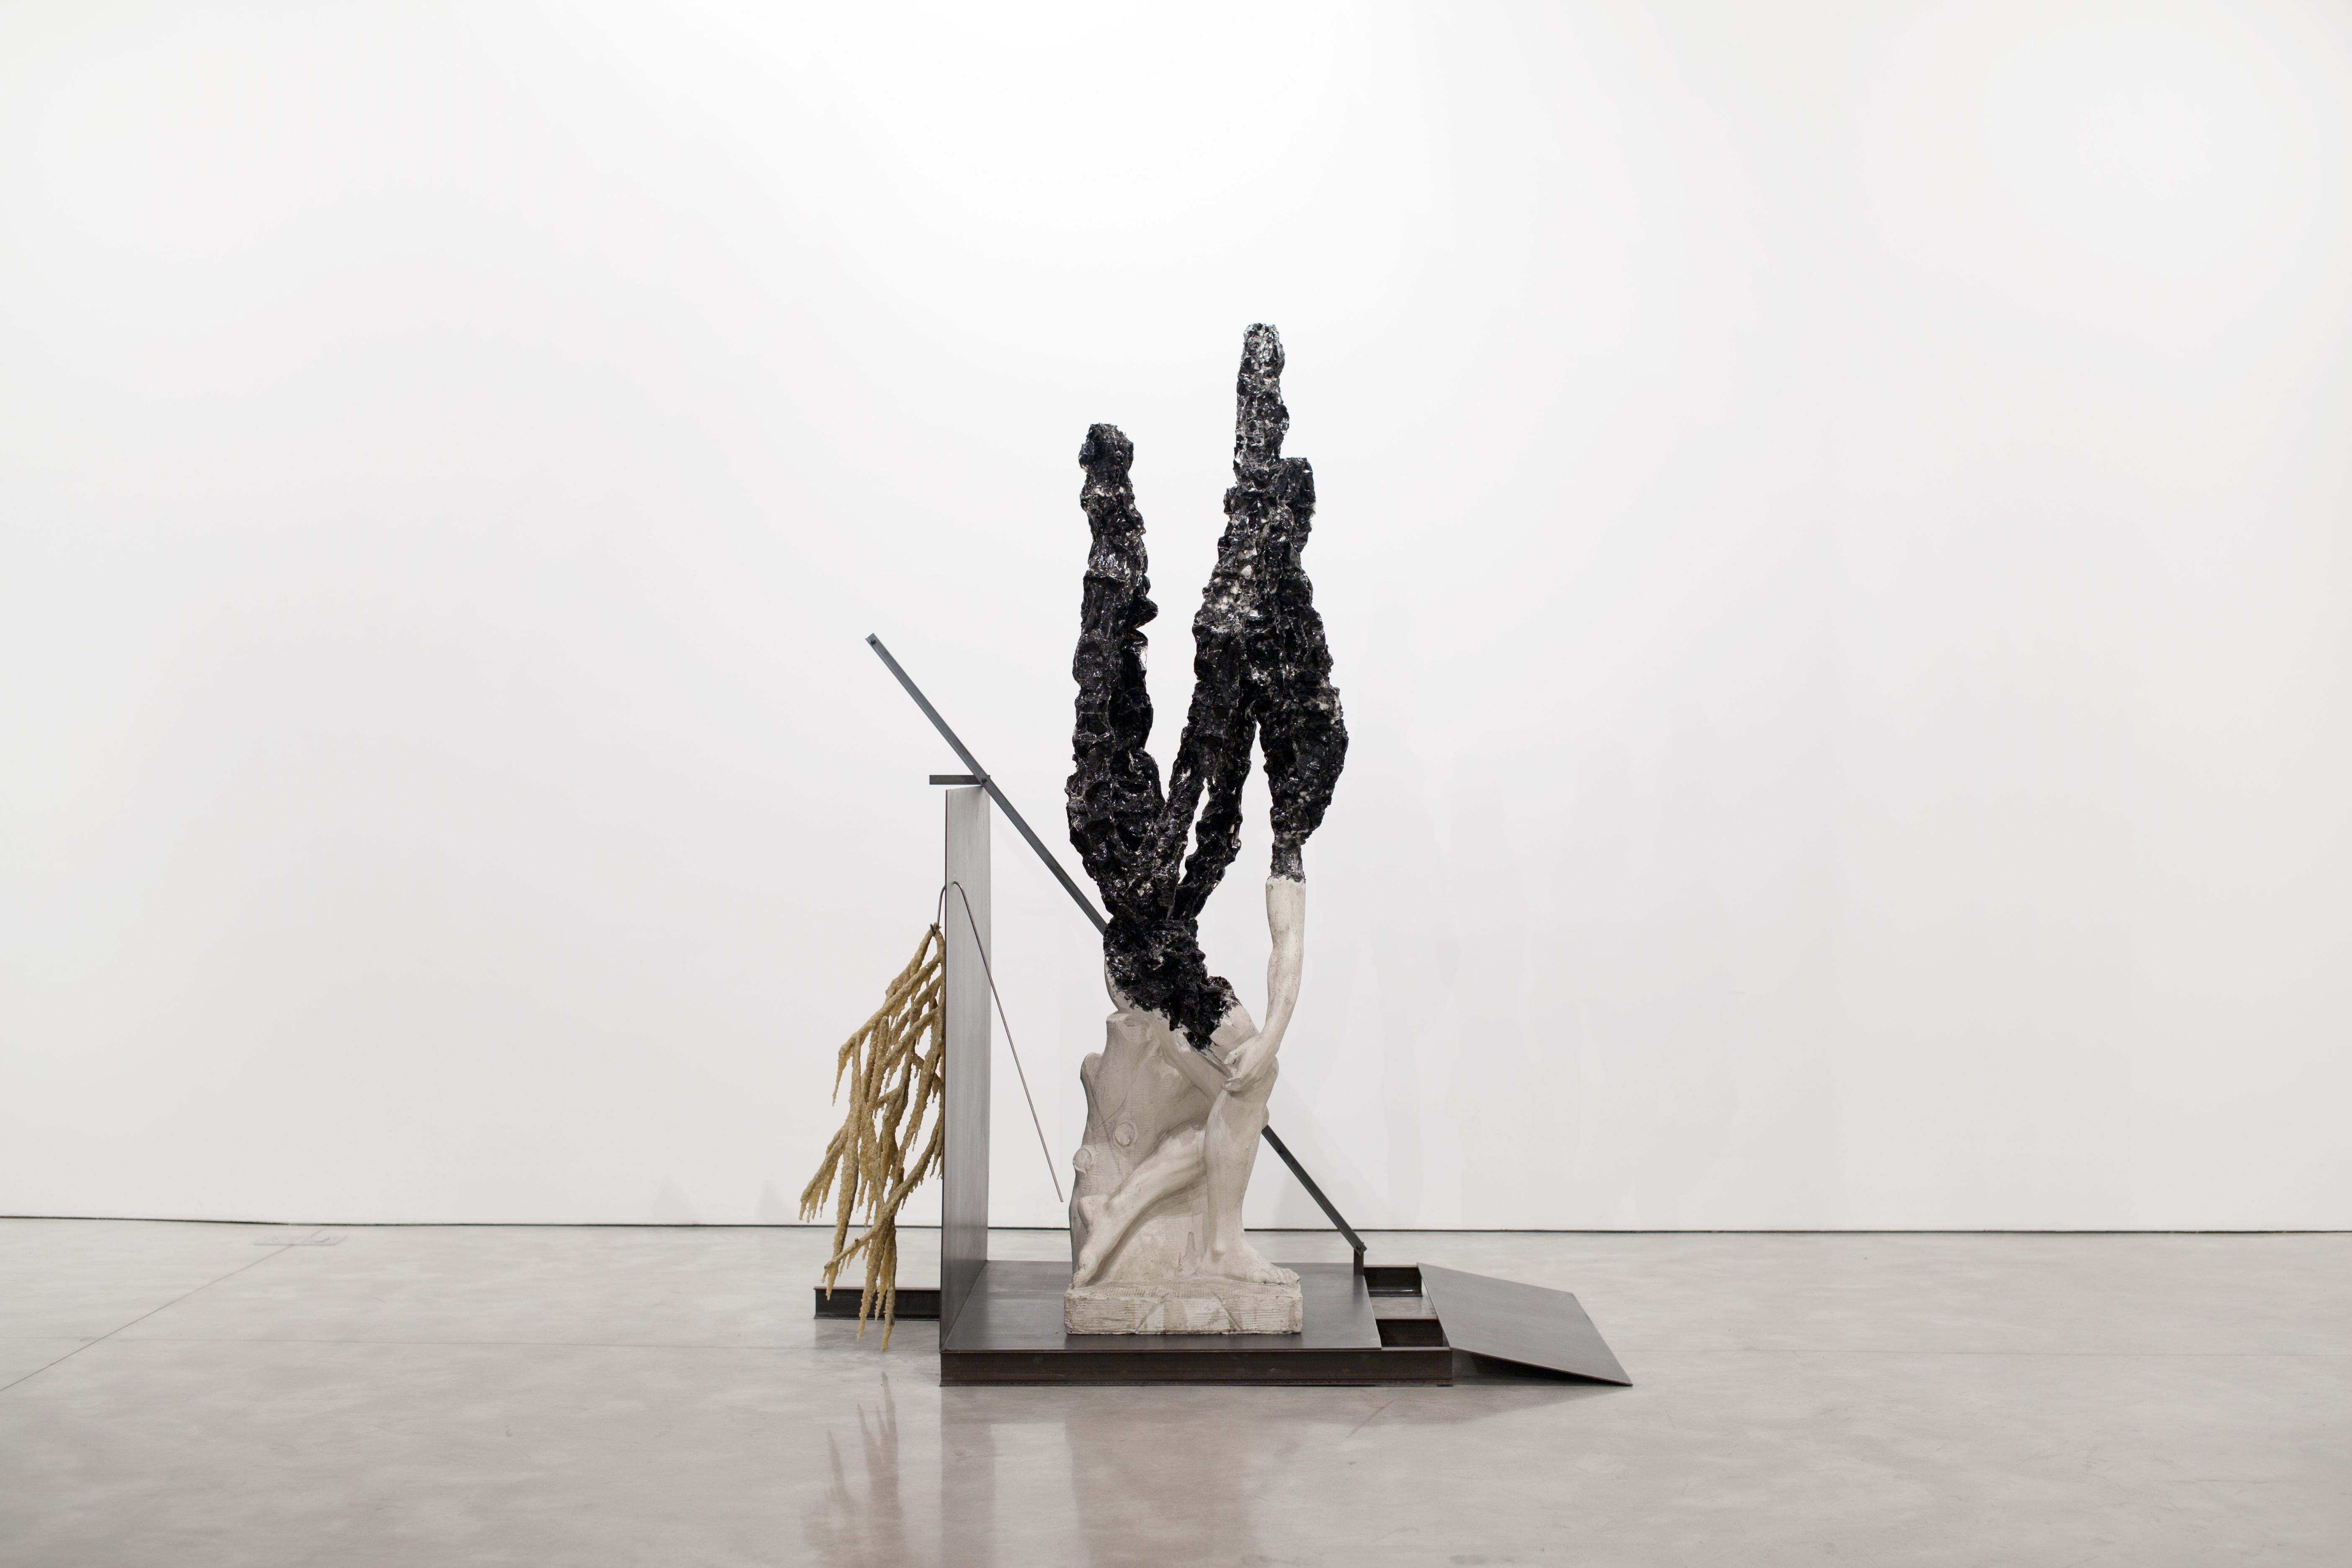 Nick van Woert Return to Nature, 2011  statua in fibra di vetro, poliuretano, patatine di polistirolo, acciaio, adesivo in poliuretano  237,5 x 123,8 x 186,7 cm Rosenblum collection, Parigi